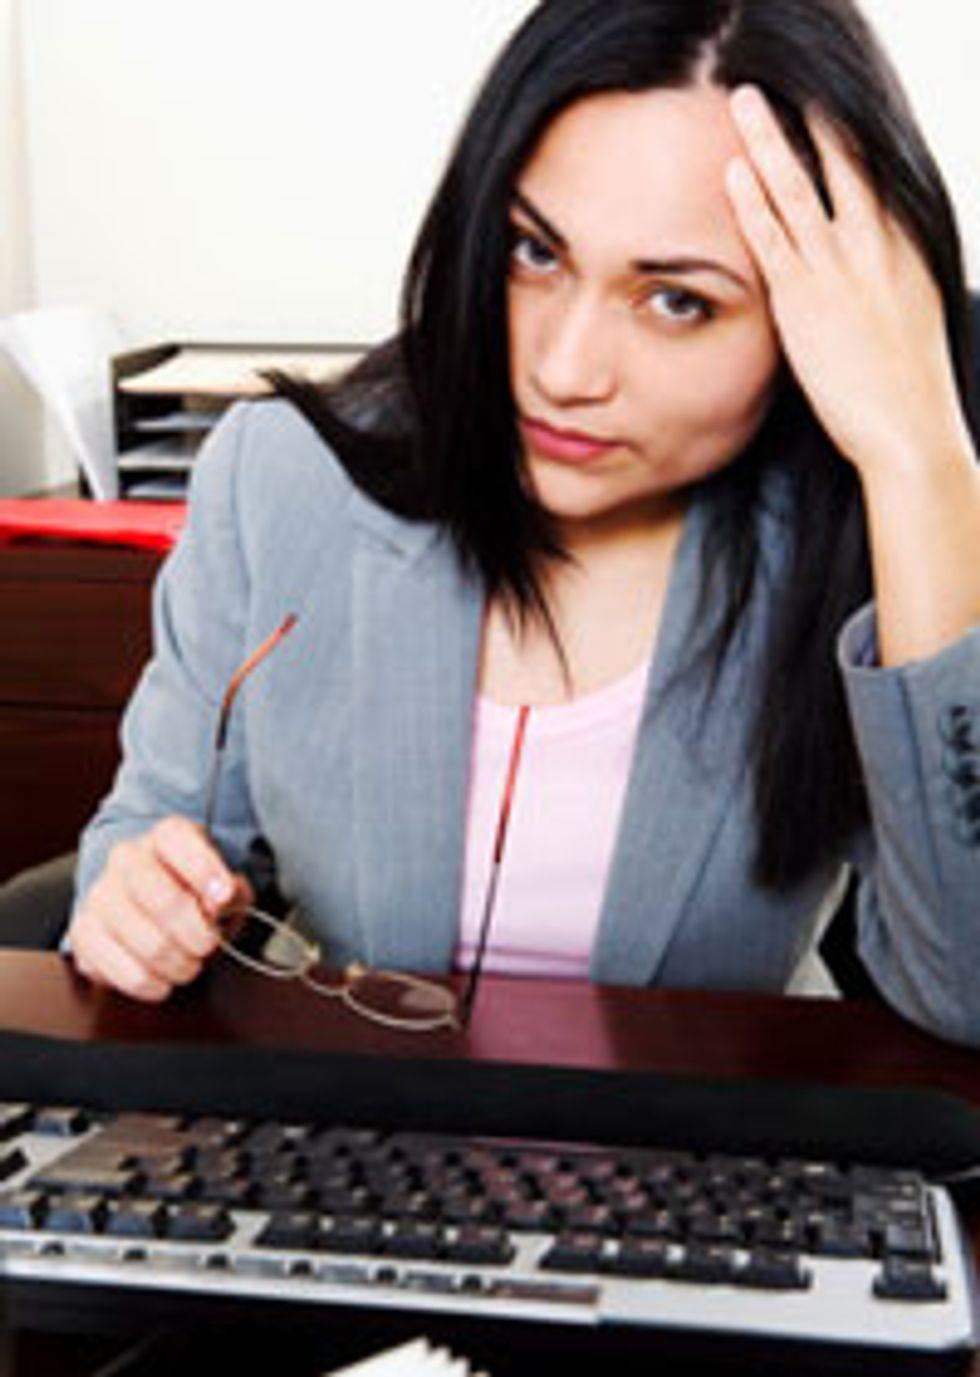 woman-stressed-715936.jpg